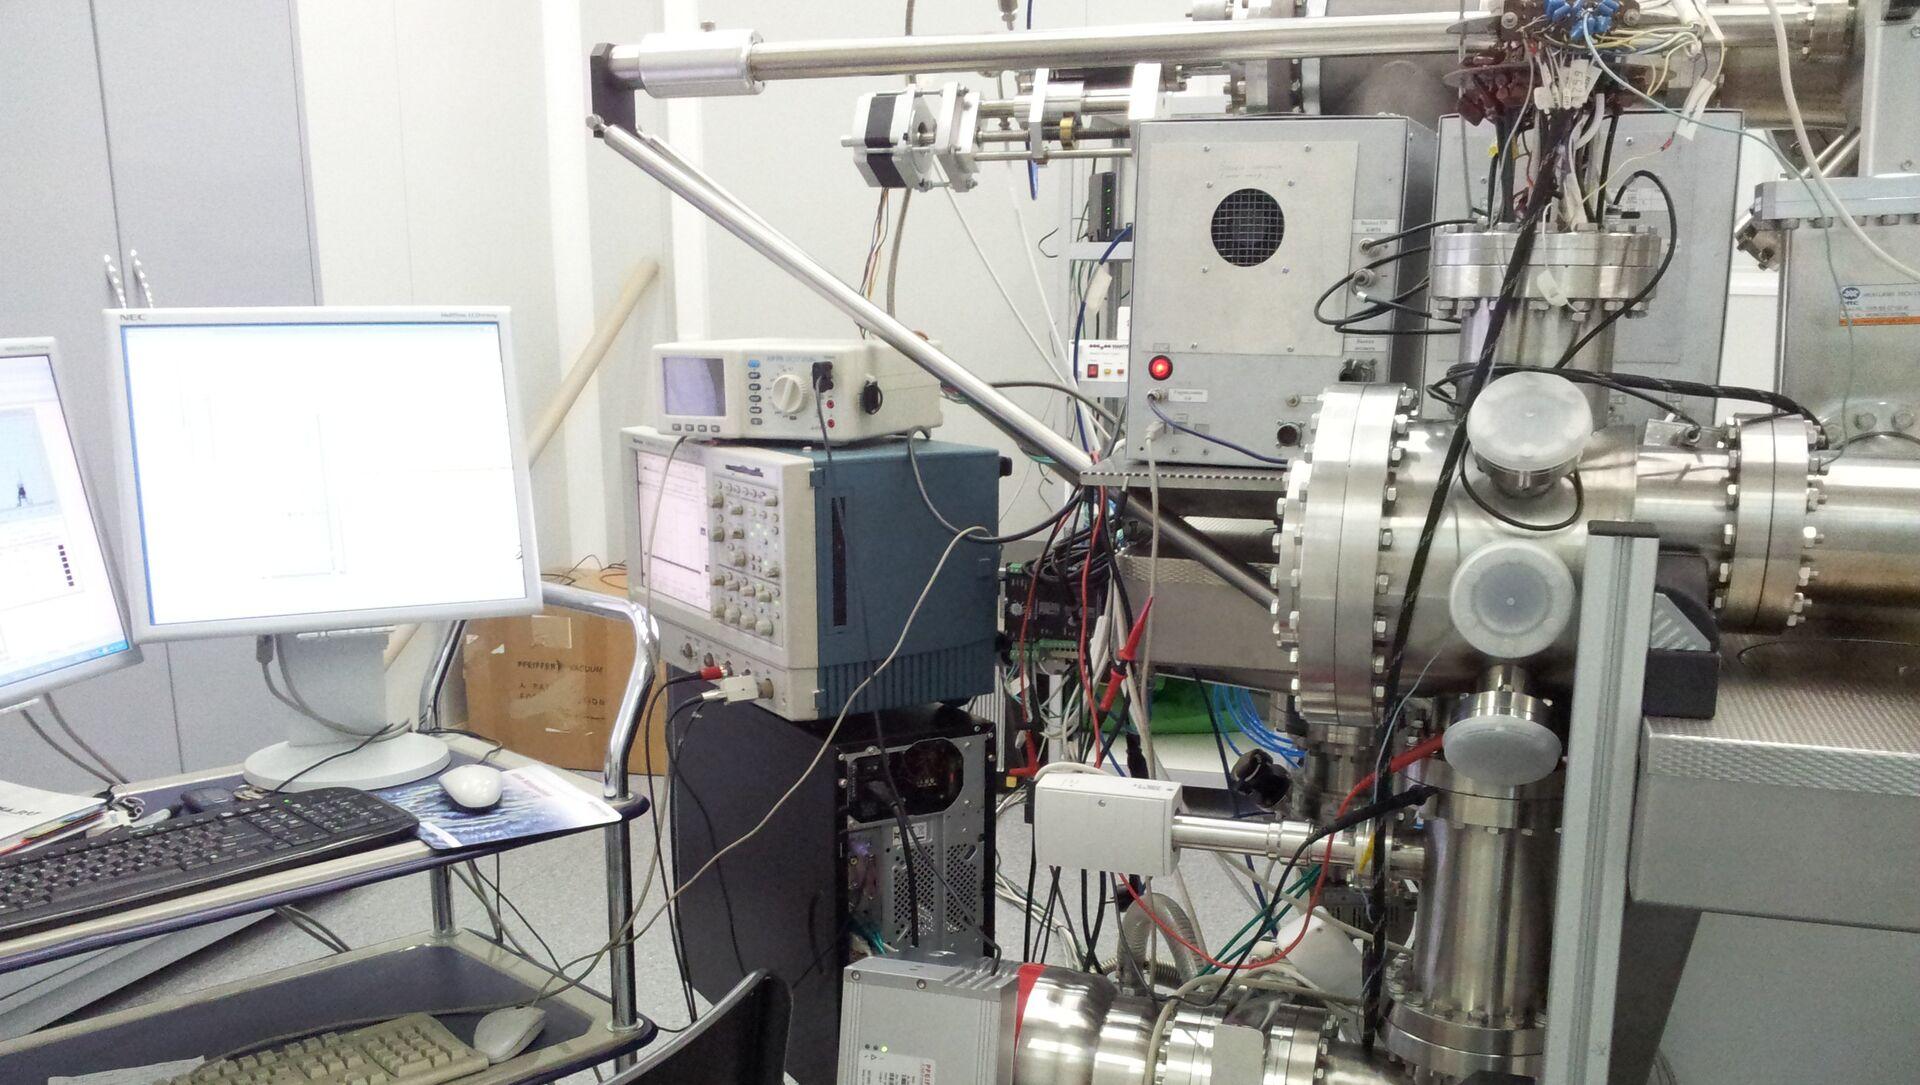 Laboratorio de la Universidad Nacional de Investigaciones Nucleares MIFI - Sputnik Mundo, 1920, 11.06.2015